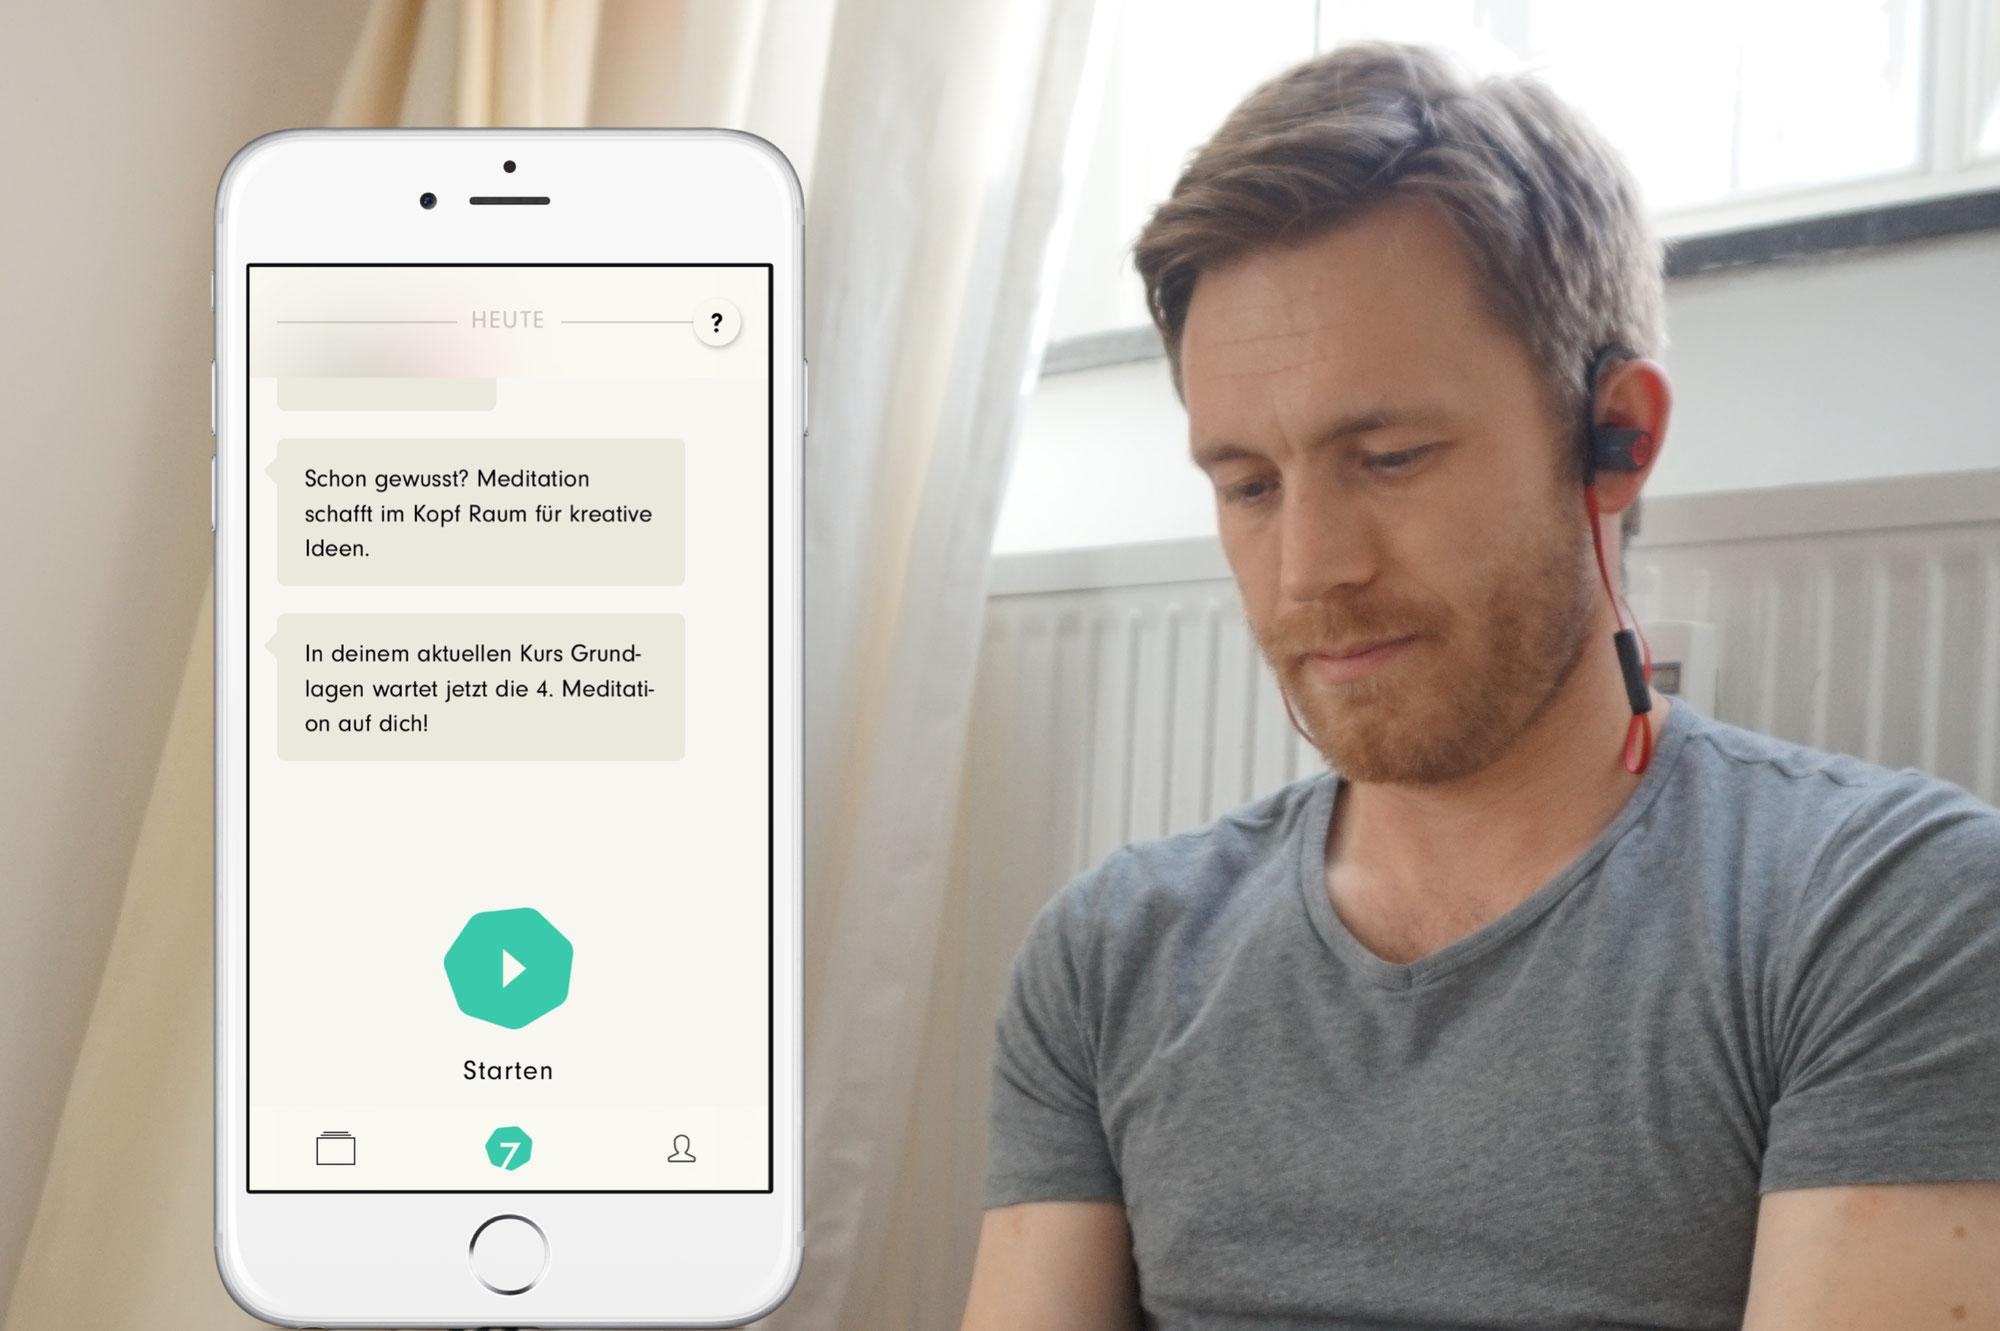 Meditations-App 7Mind im Test: Hot oder Schrott?